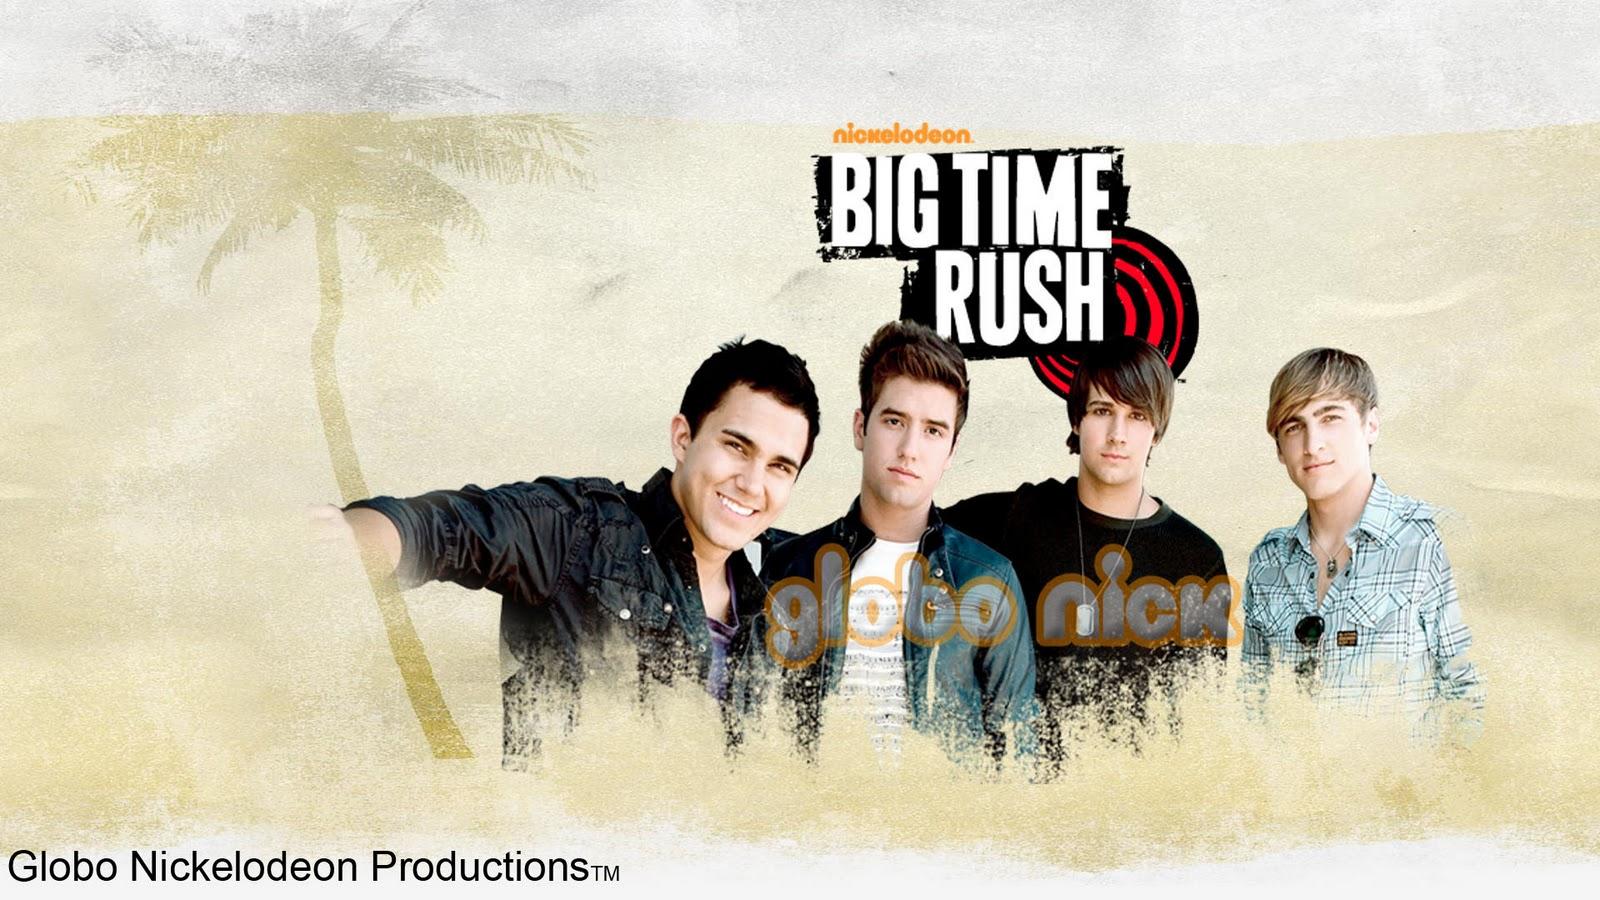 http://4.bp.blogspot.com/-b1SbfWkbYNk/Tqyfk3xaMqI/AAAAAAAABqs/LoUlELGtt_Y/s1600/Wallpaper_Big_Time_Rush_1920x1080.jpg